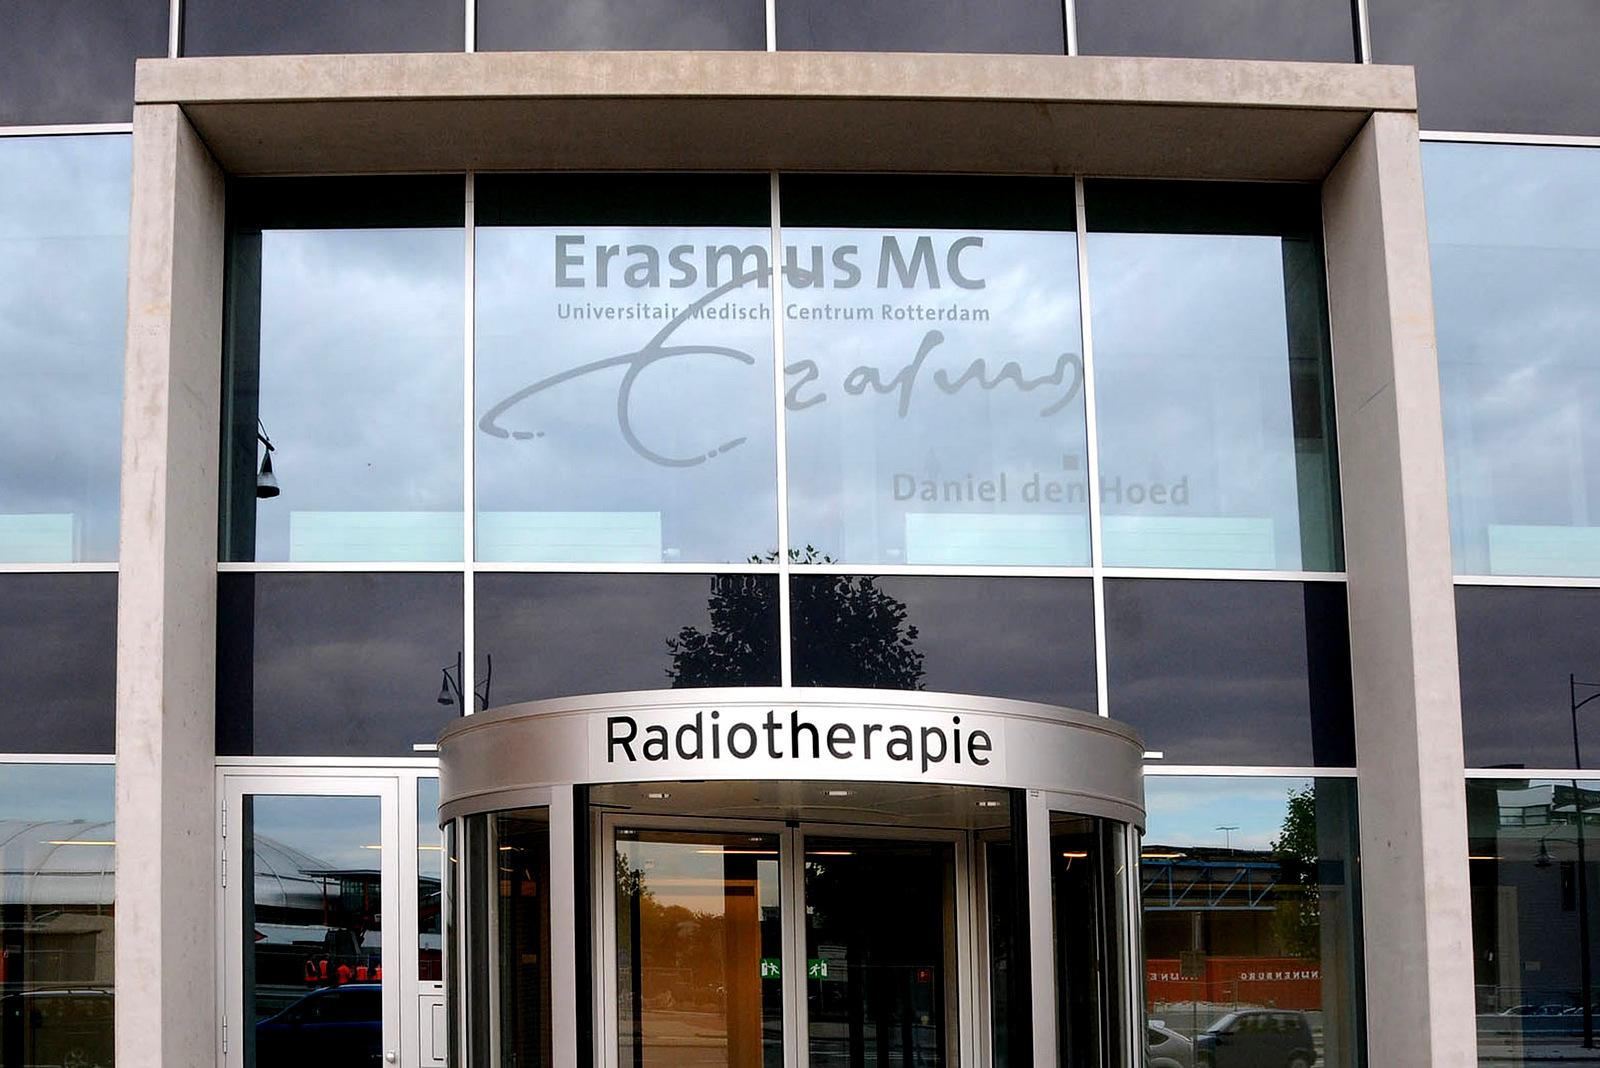 Erasmus MC Dordrecht